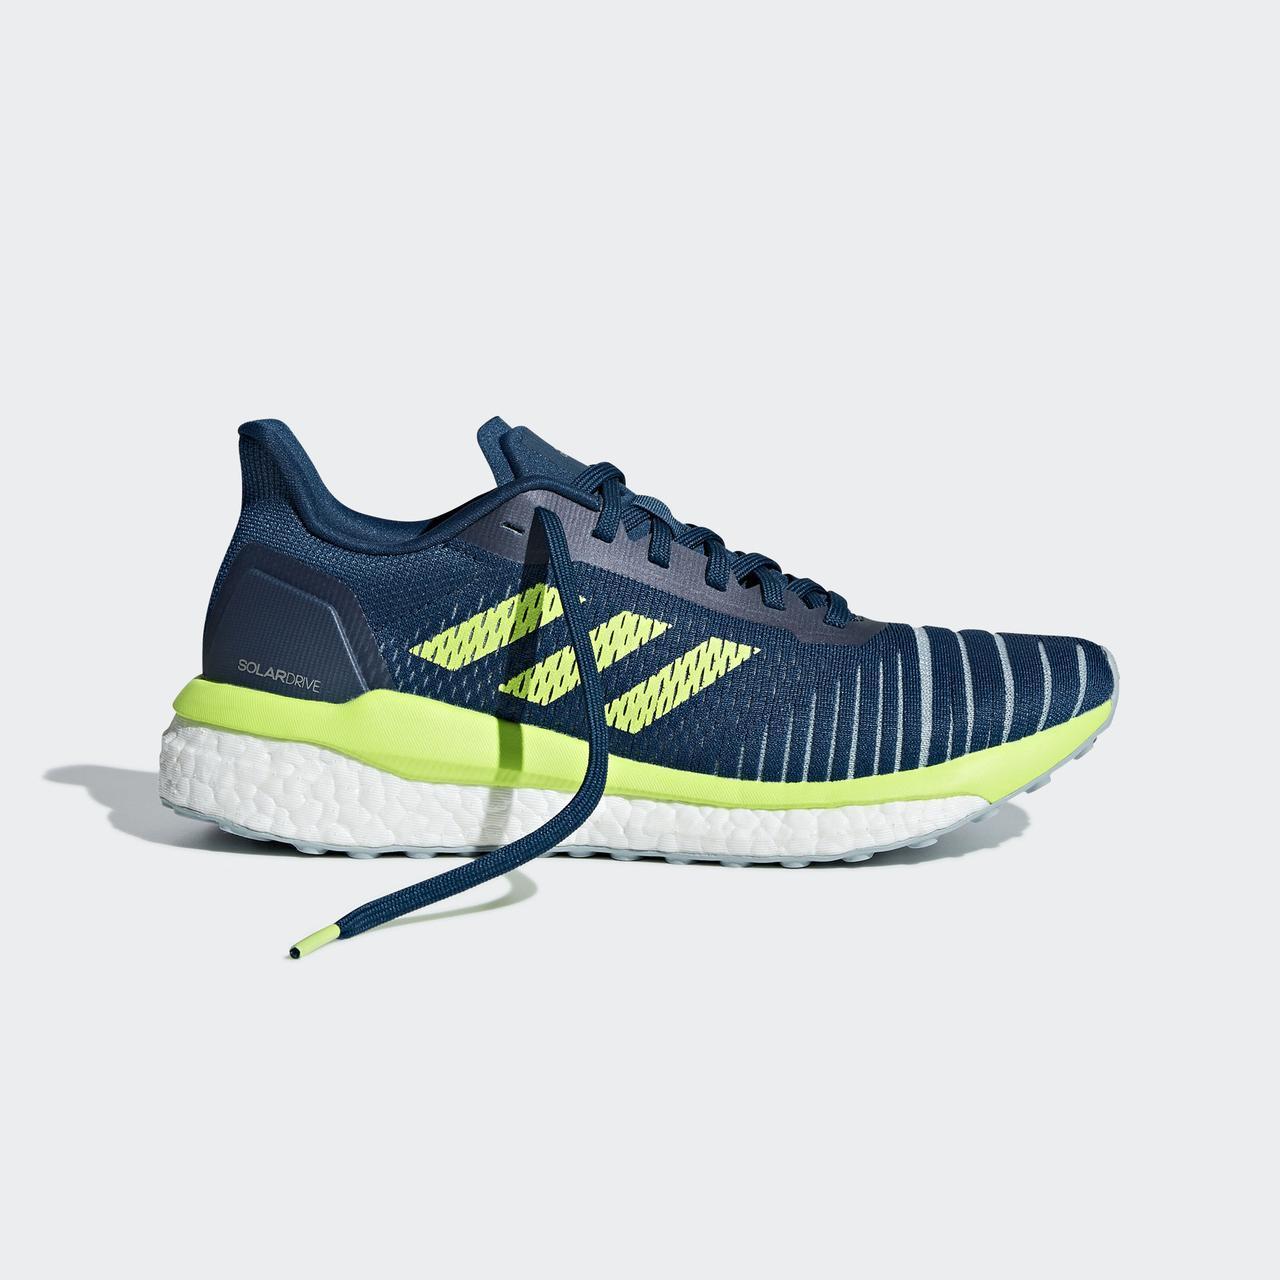 c7e37ec7 Беговые кроссовки Adidas Solar Drive D97430 - 2019: продажа, цена в ...